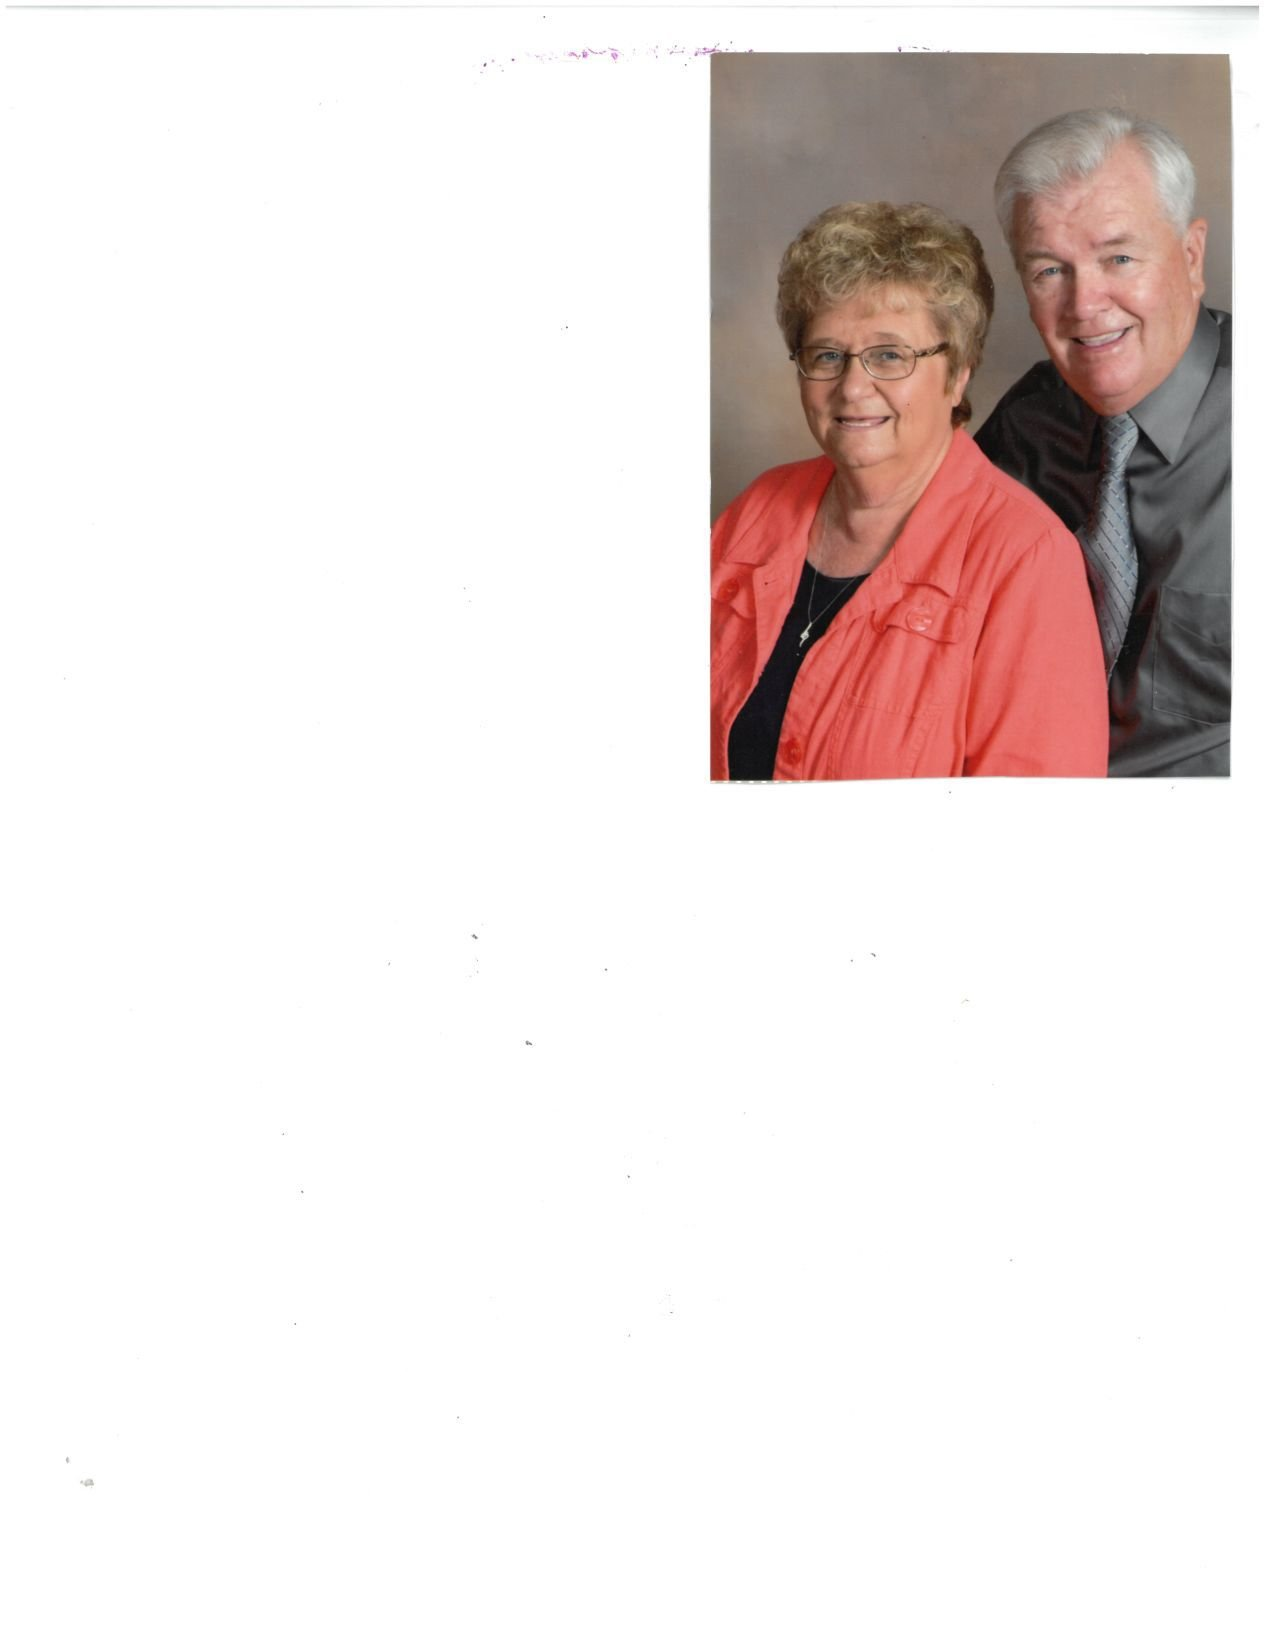 Gene and Lou Ann Roling